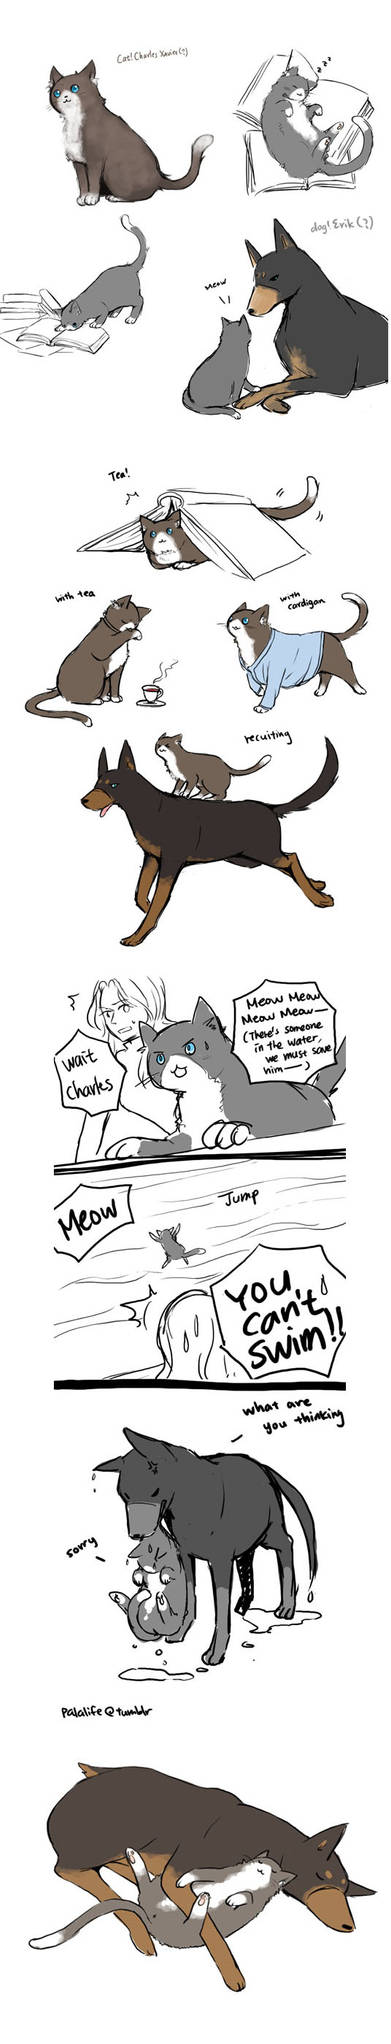 XMFC: catCharles and dogErik